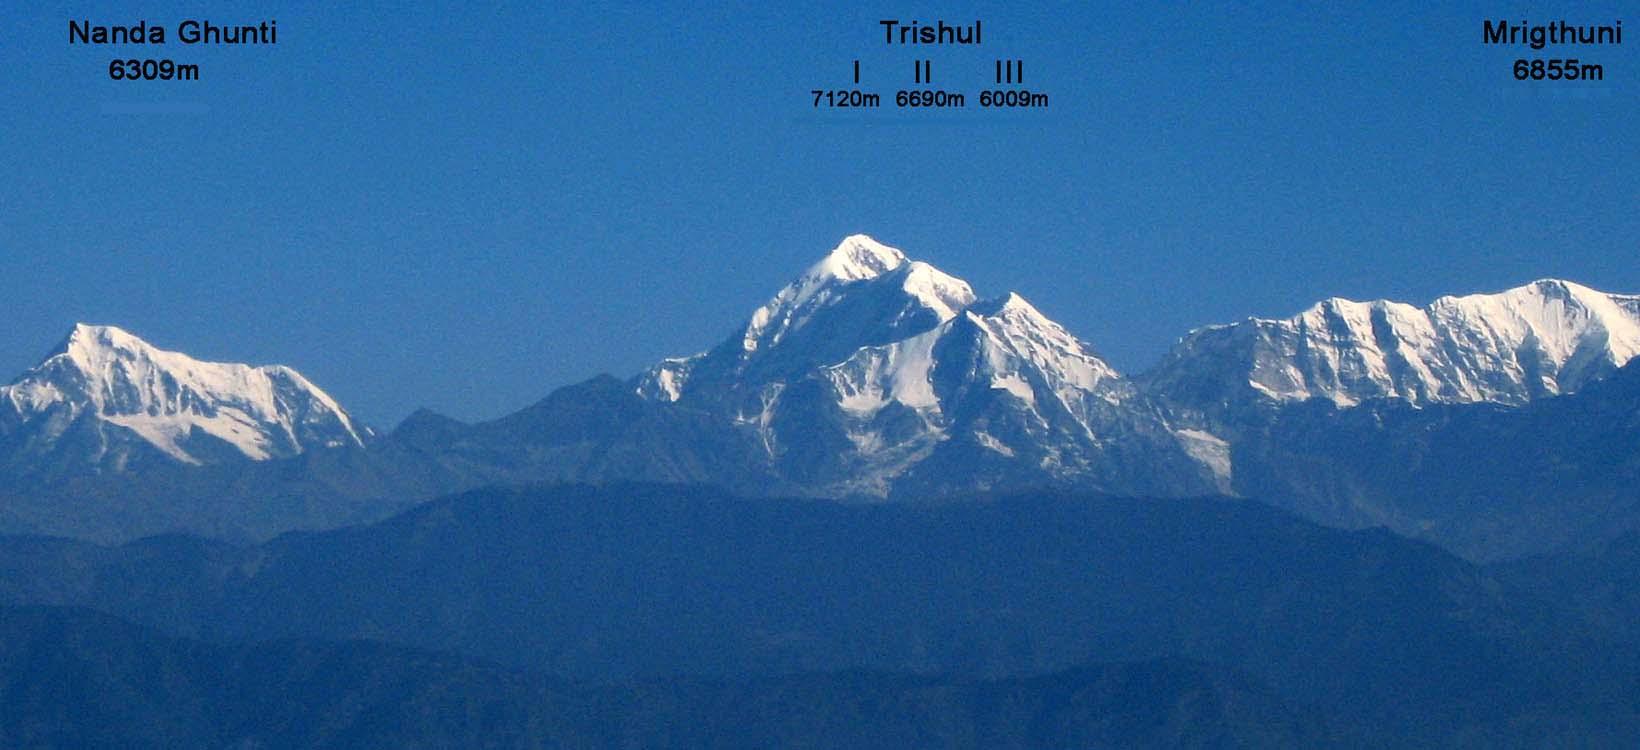 Trishul from Kausani